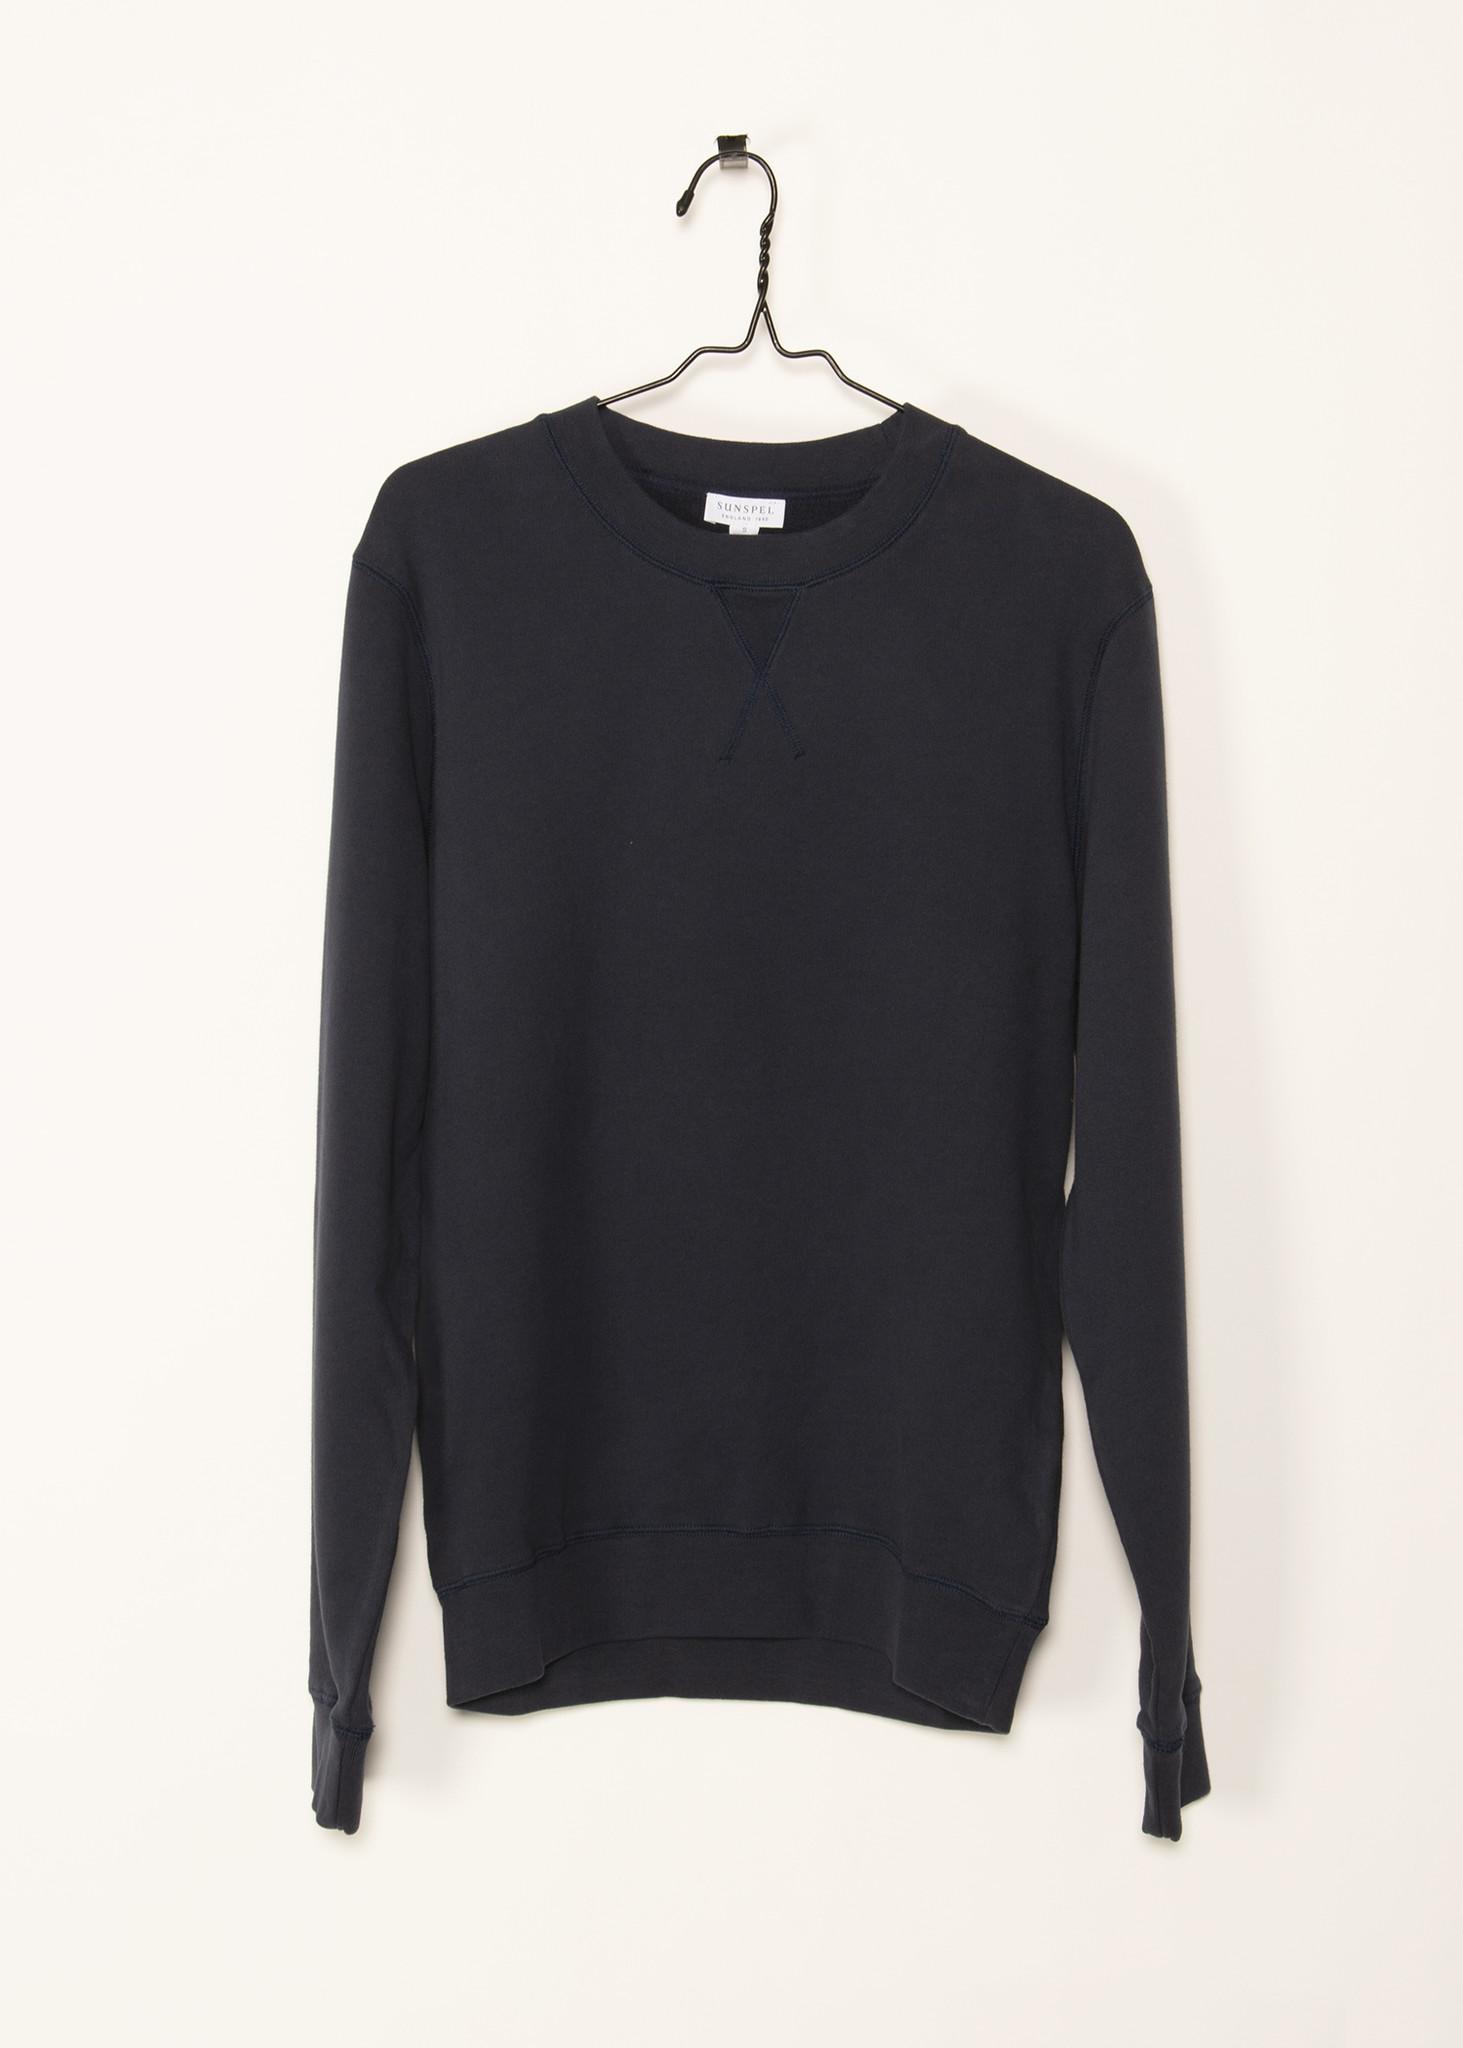 Black Loopback Sweater